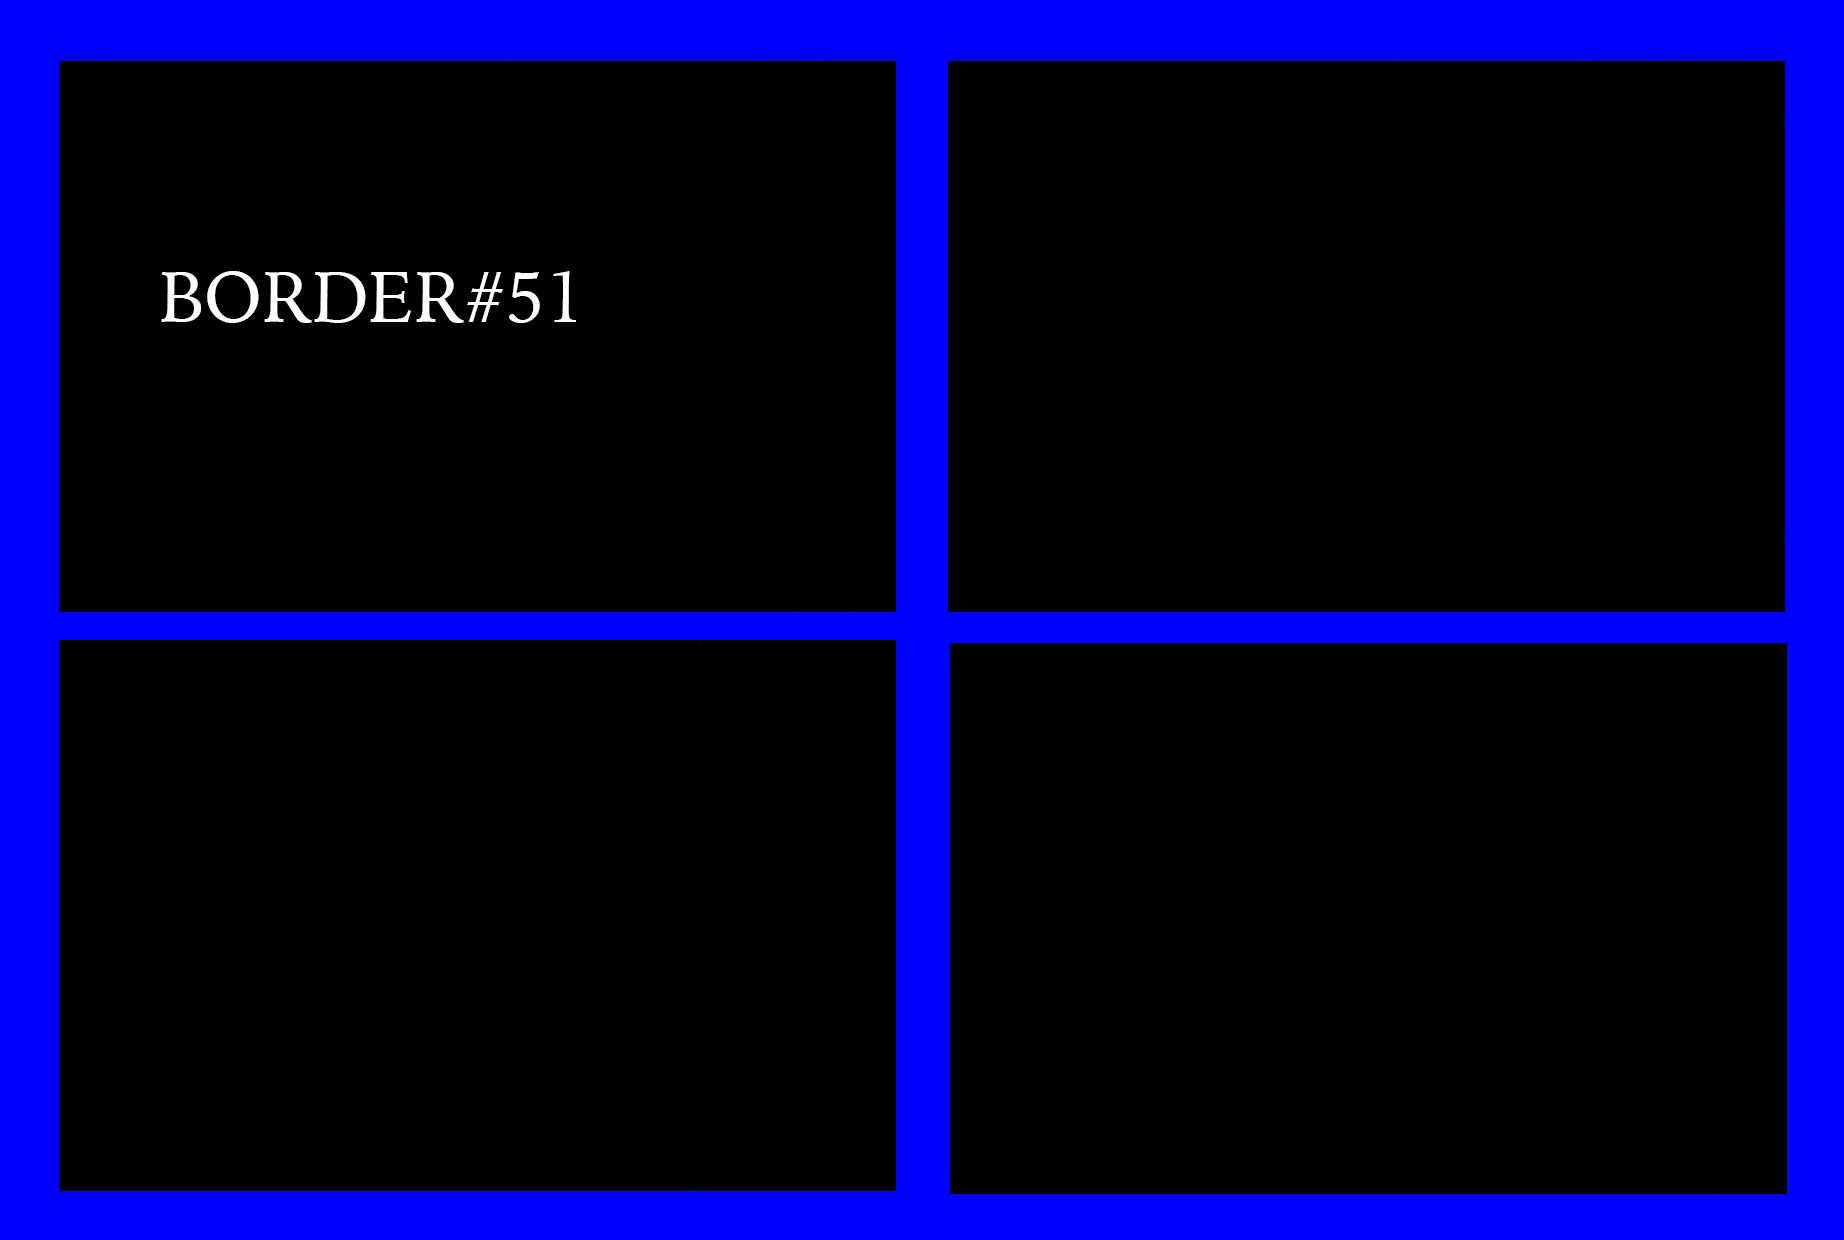 BORDER#51